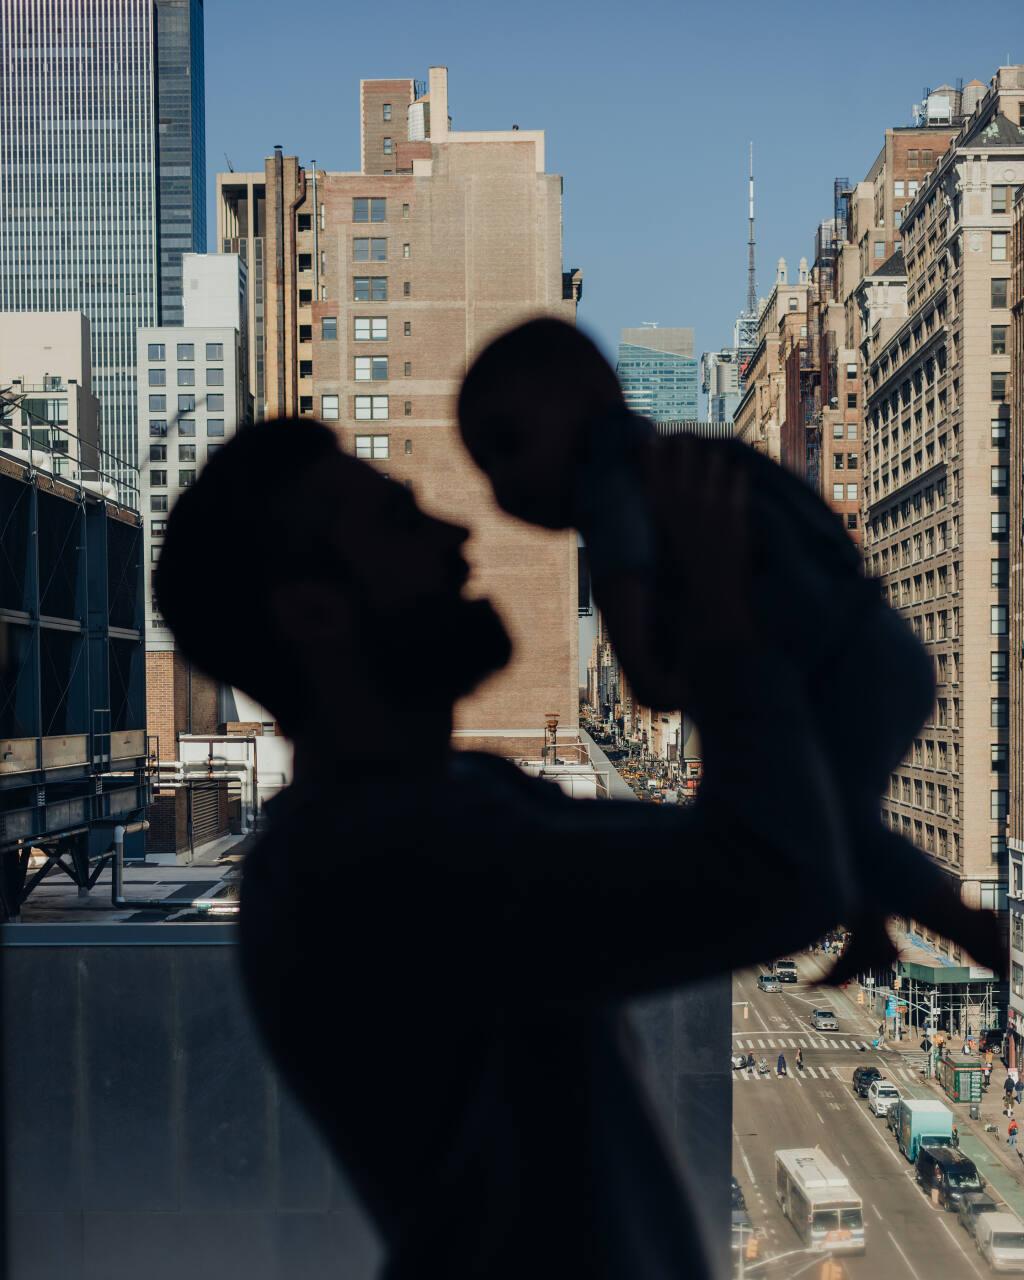 SASHA ARUTYUNOVA / New York Times